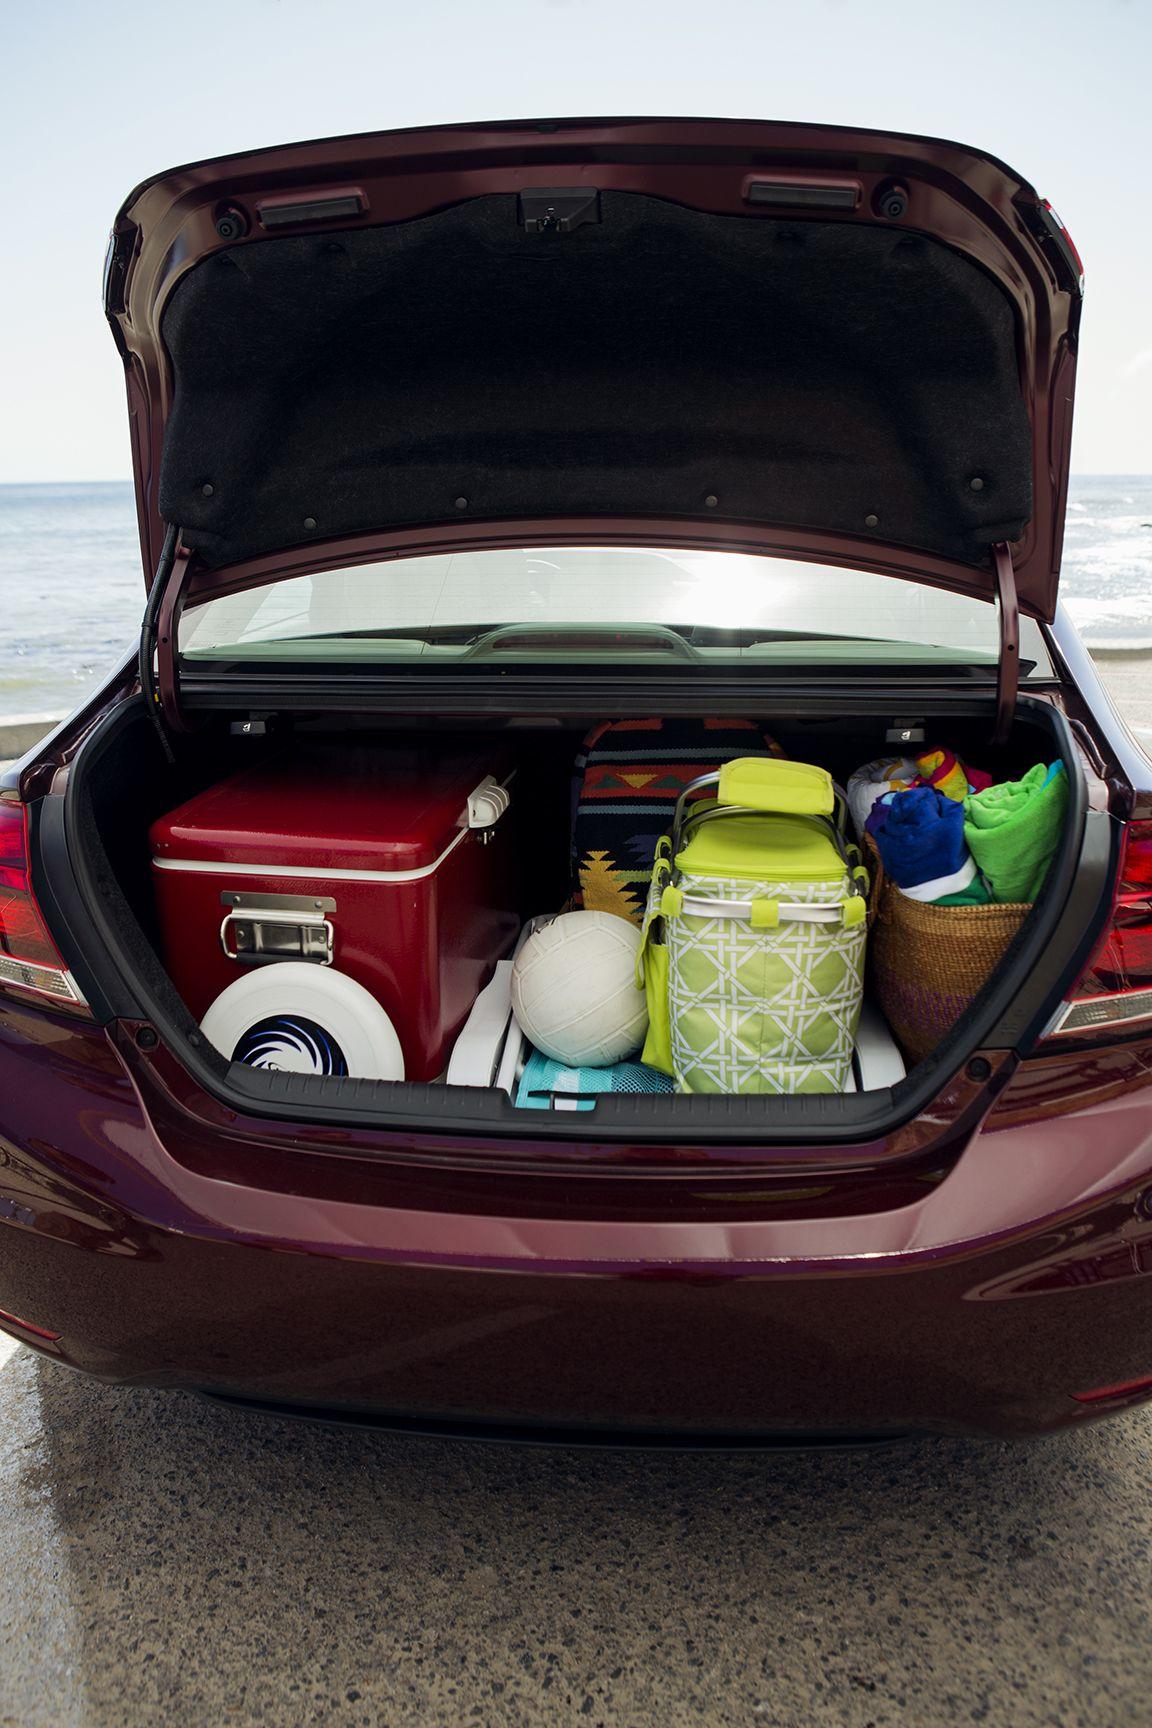 Honda Civic Family Hybrid Coupe Sedan Si Natural Gas Honda Civic Honda Honda Models